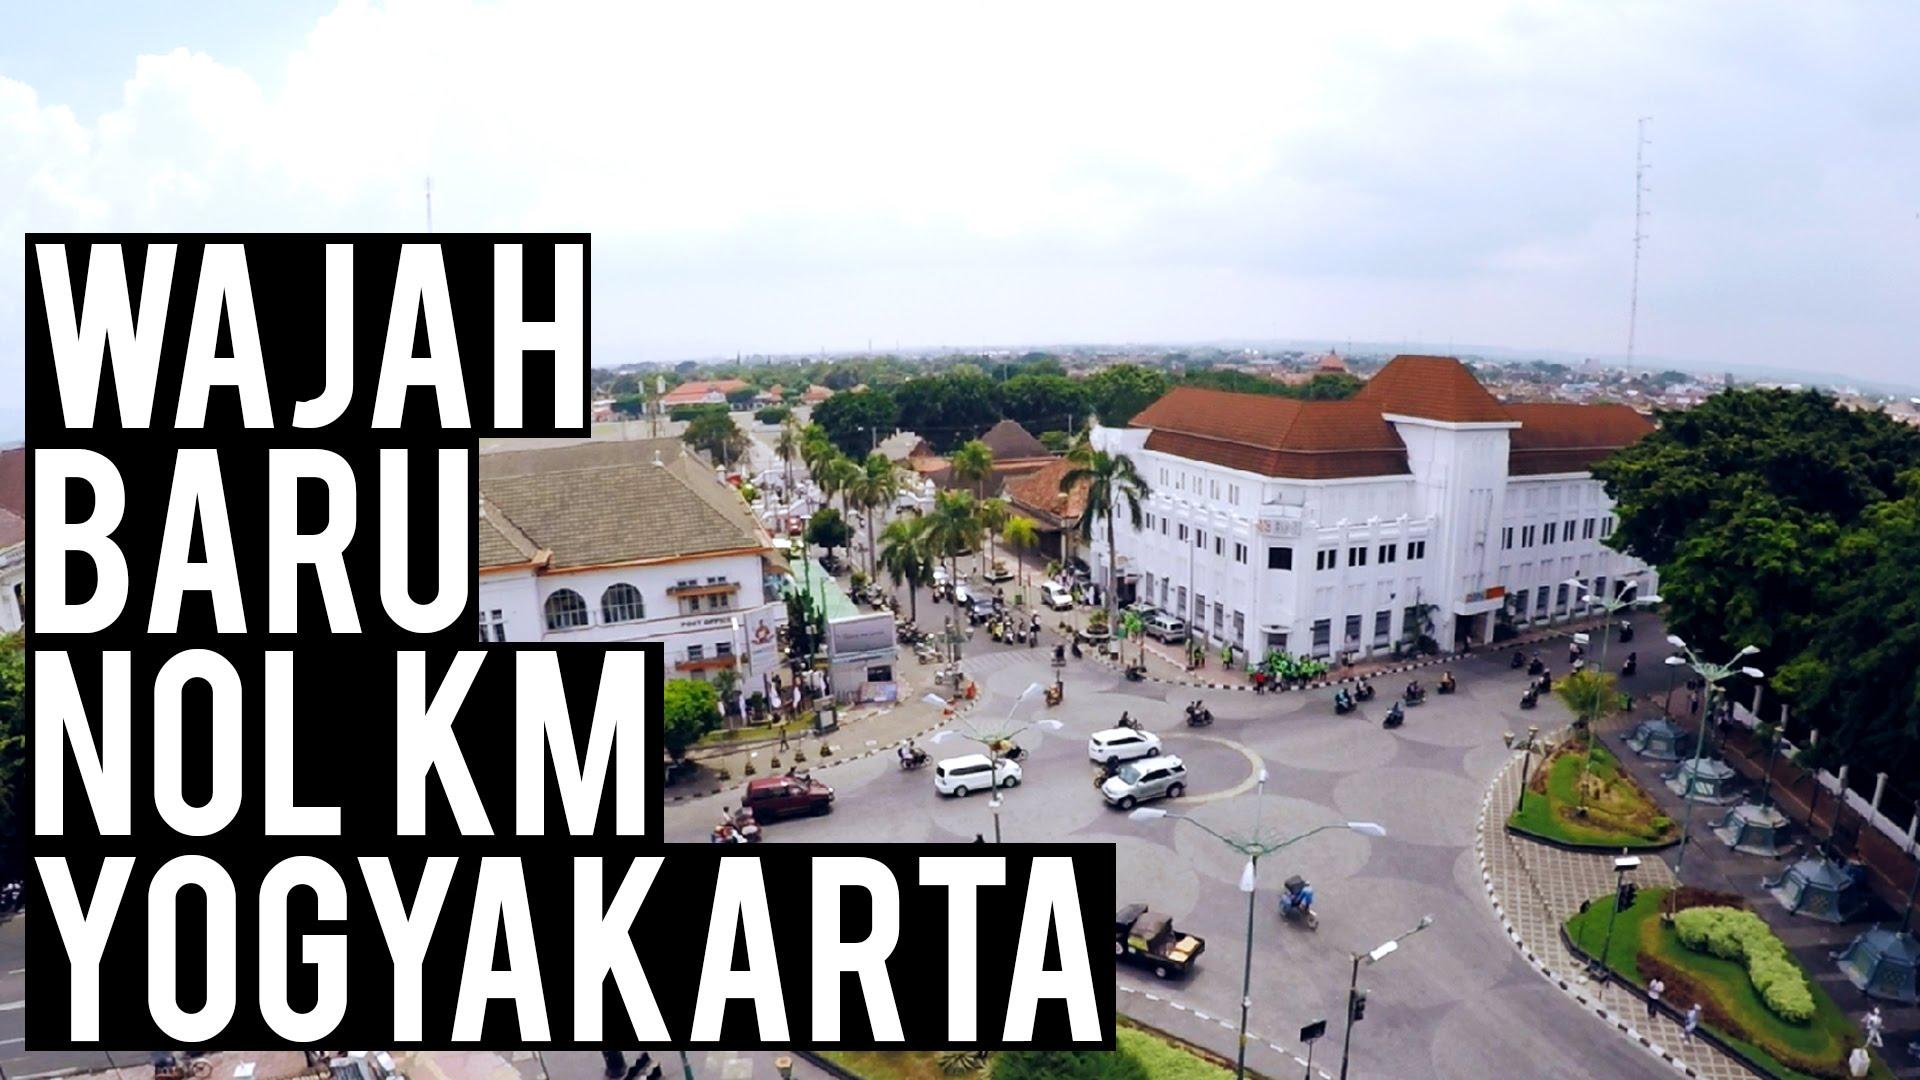 Wajah Nol Km Jogja Youtube Titik Kota Yogyakarta